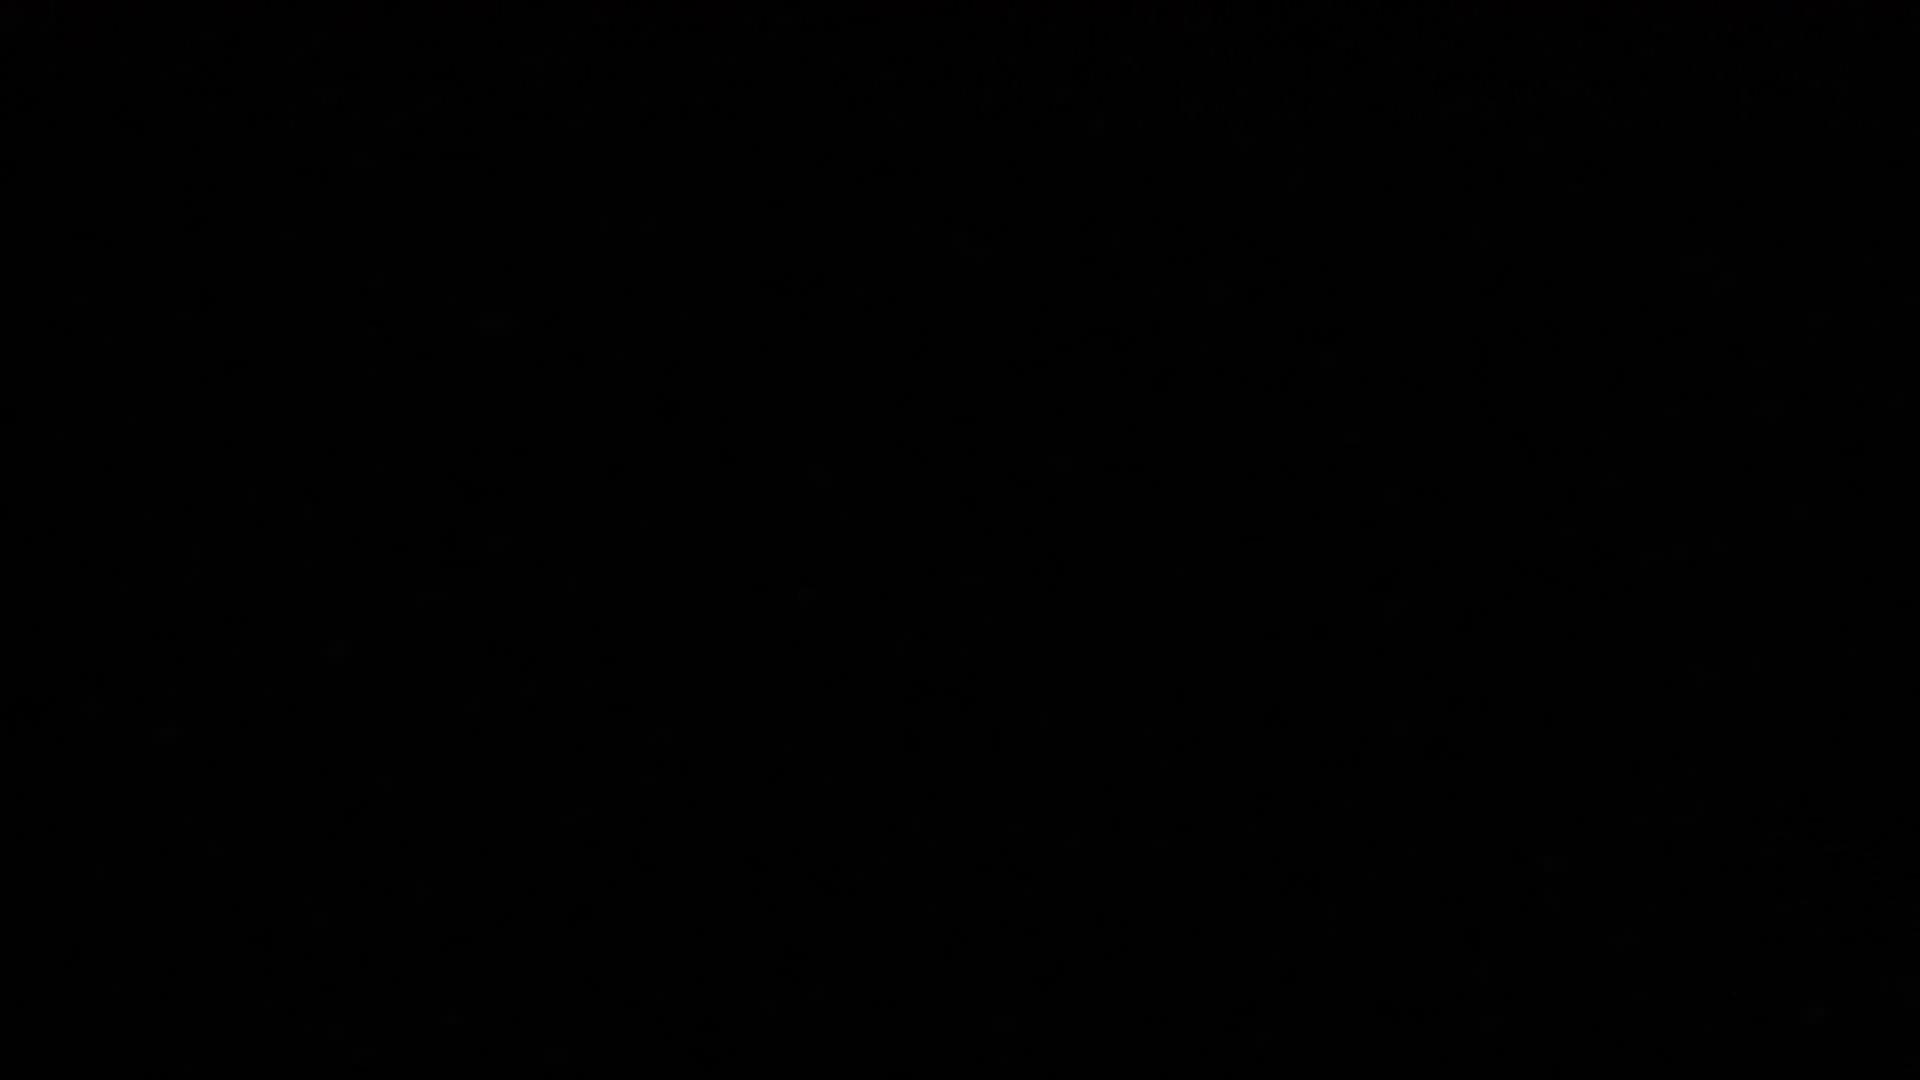 SPYさん初投稿!マンション覗き!5000K!ハイビジョン撮影VOL.05(元サッカー部員社会人) 念願の完全無修正 ゲイアダルト画像 75連発 46